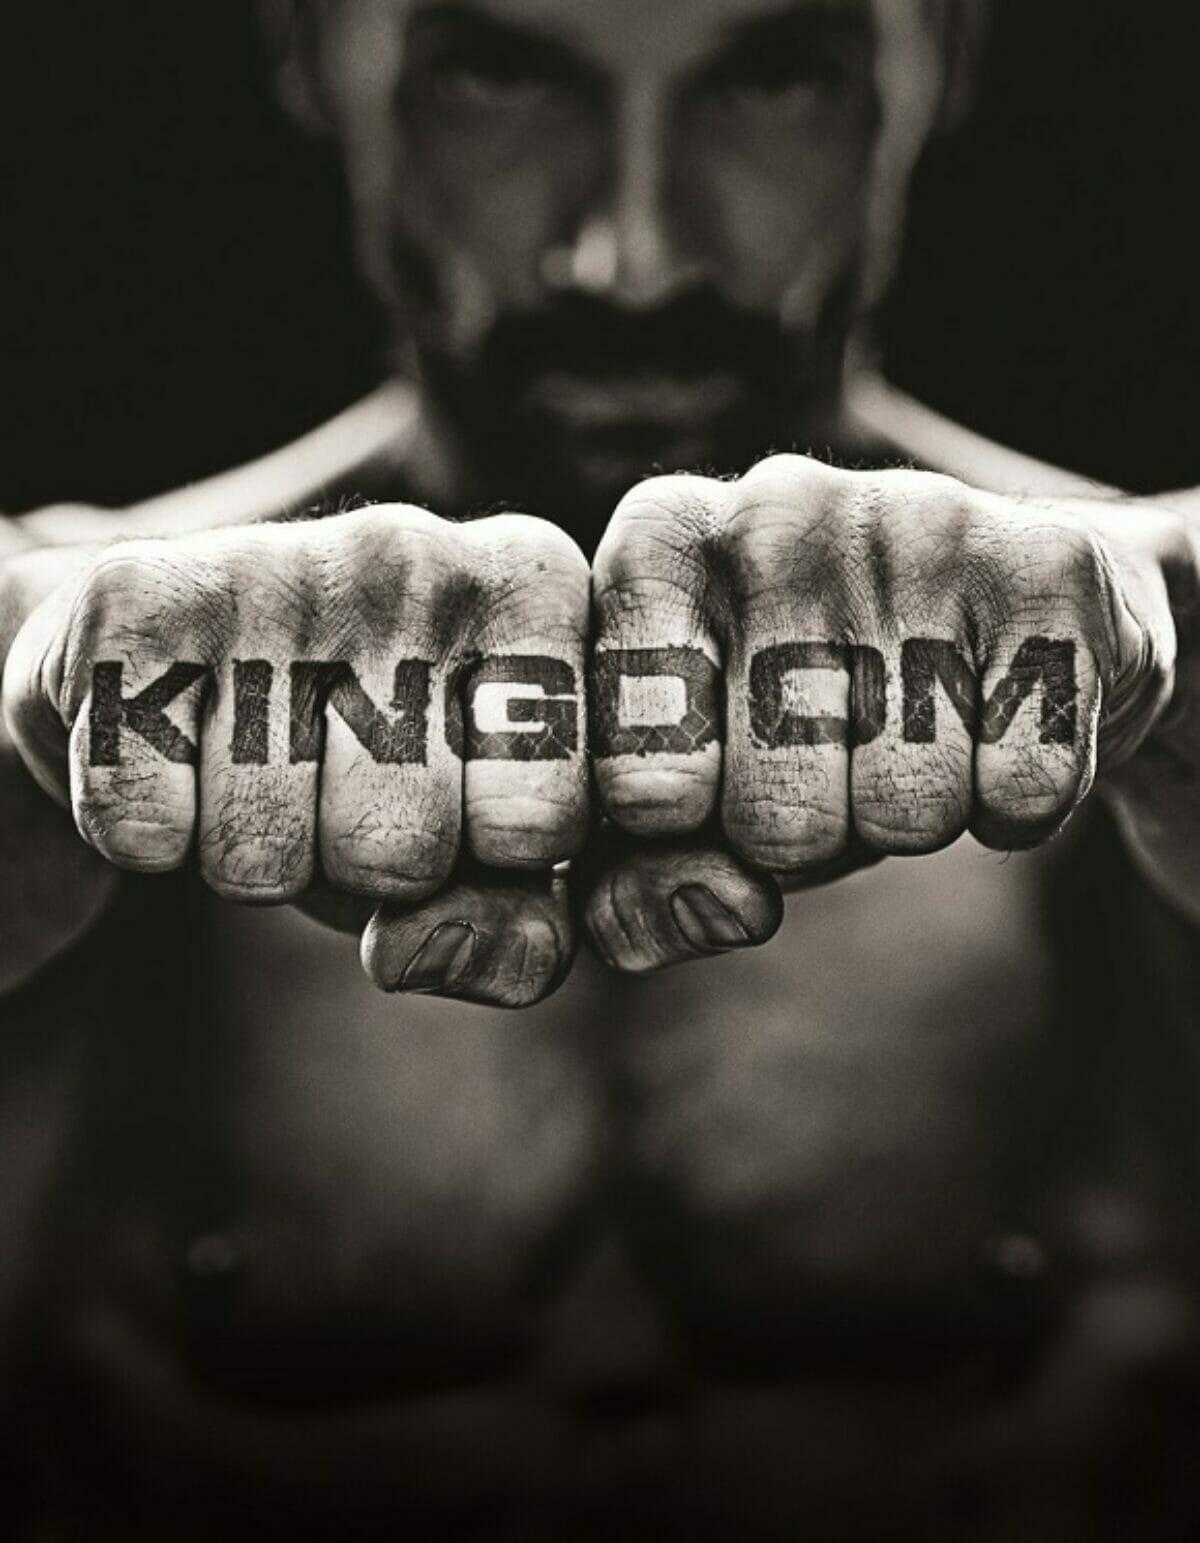 Kingdom-saison2-poster